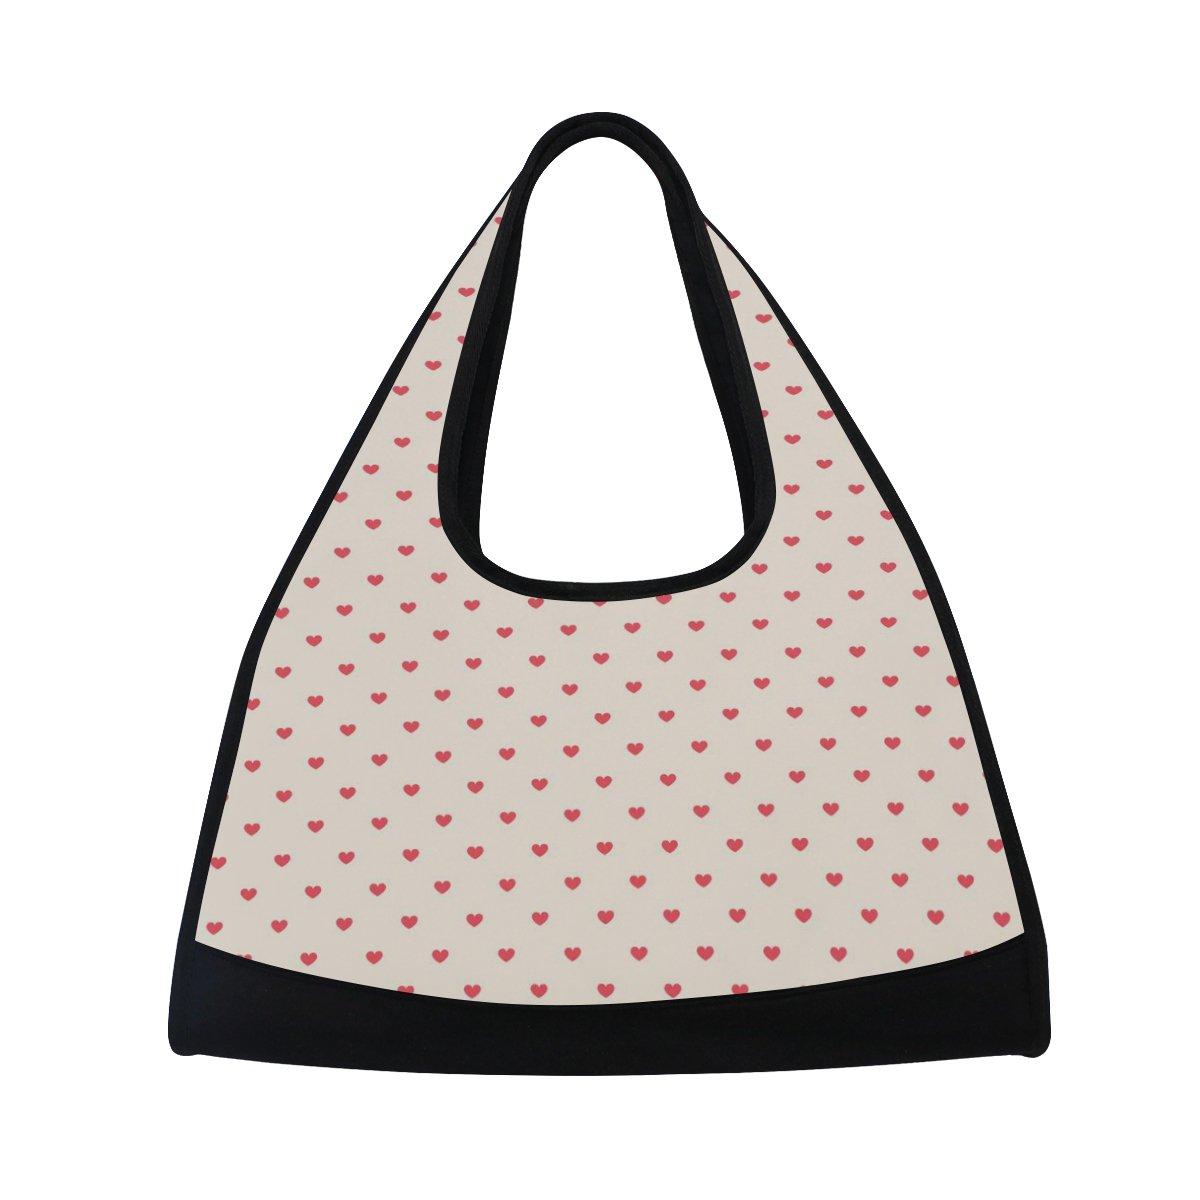 Sport Gym Bag Valentine's Day Heart Love Canvas Travel Duffel Bag